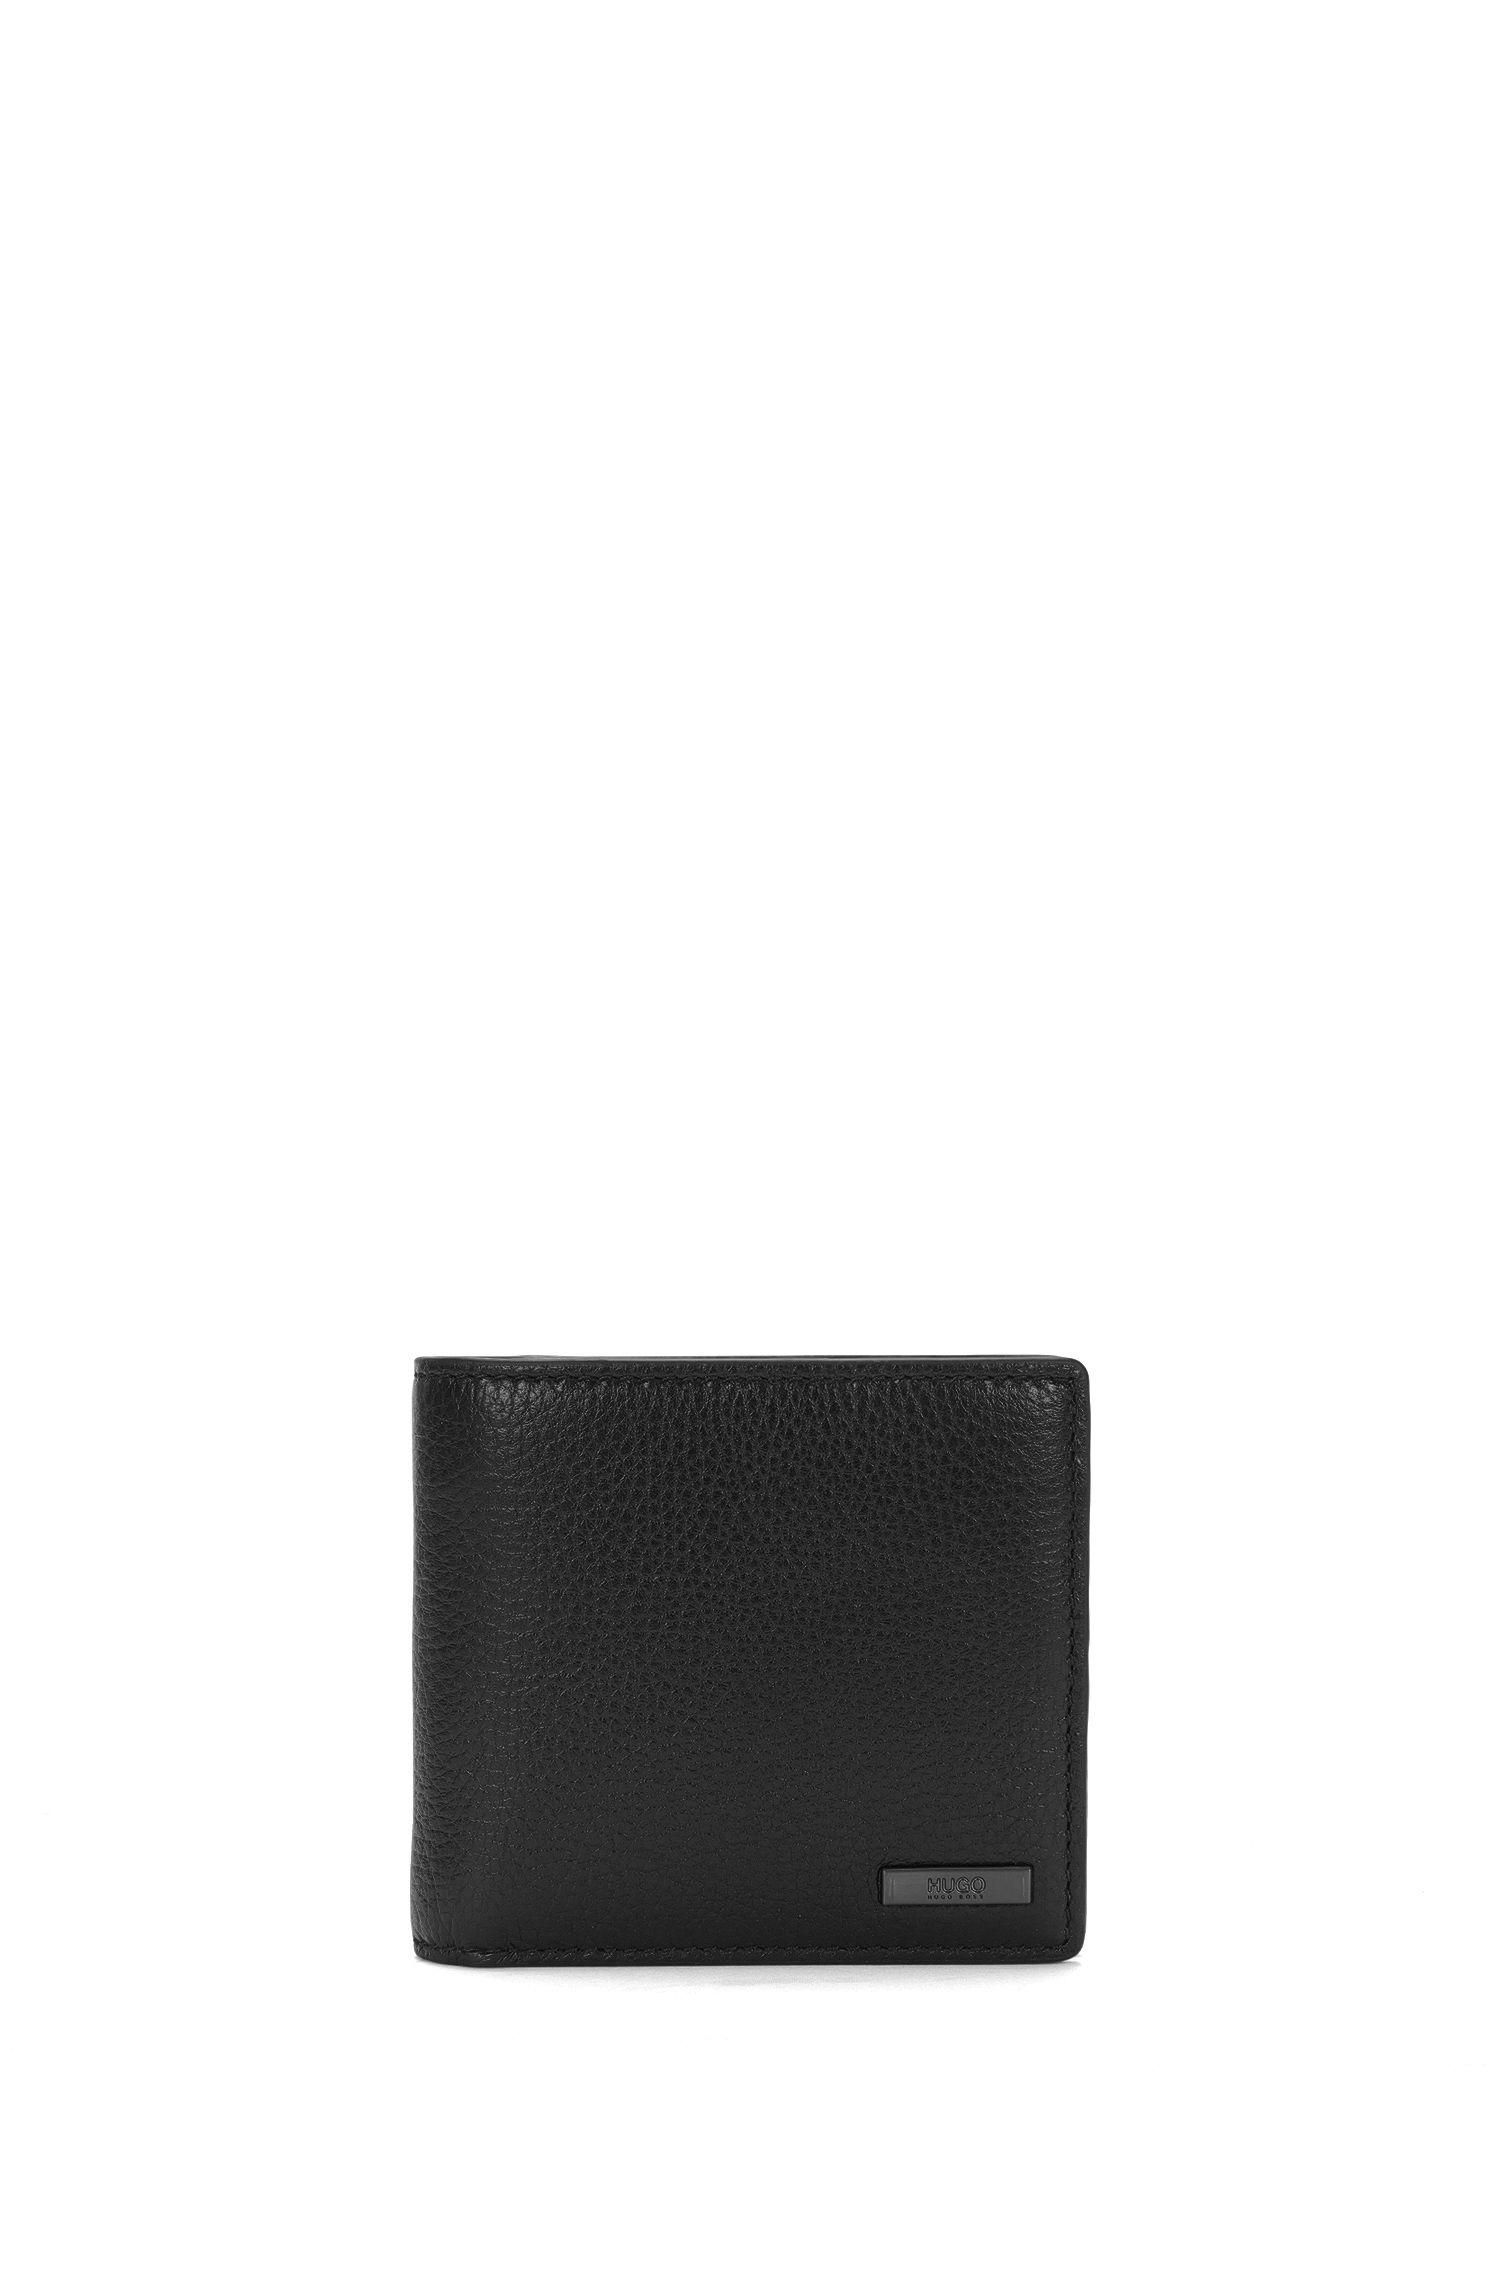 Klapp-Geldbörse aus genarbtem Leder